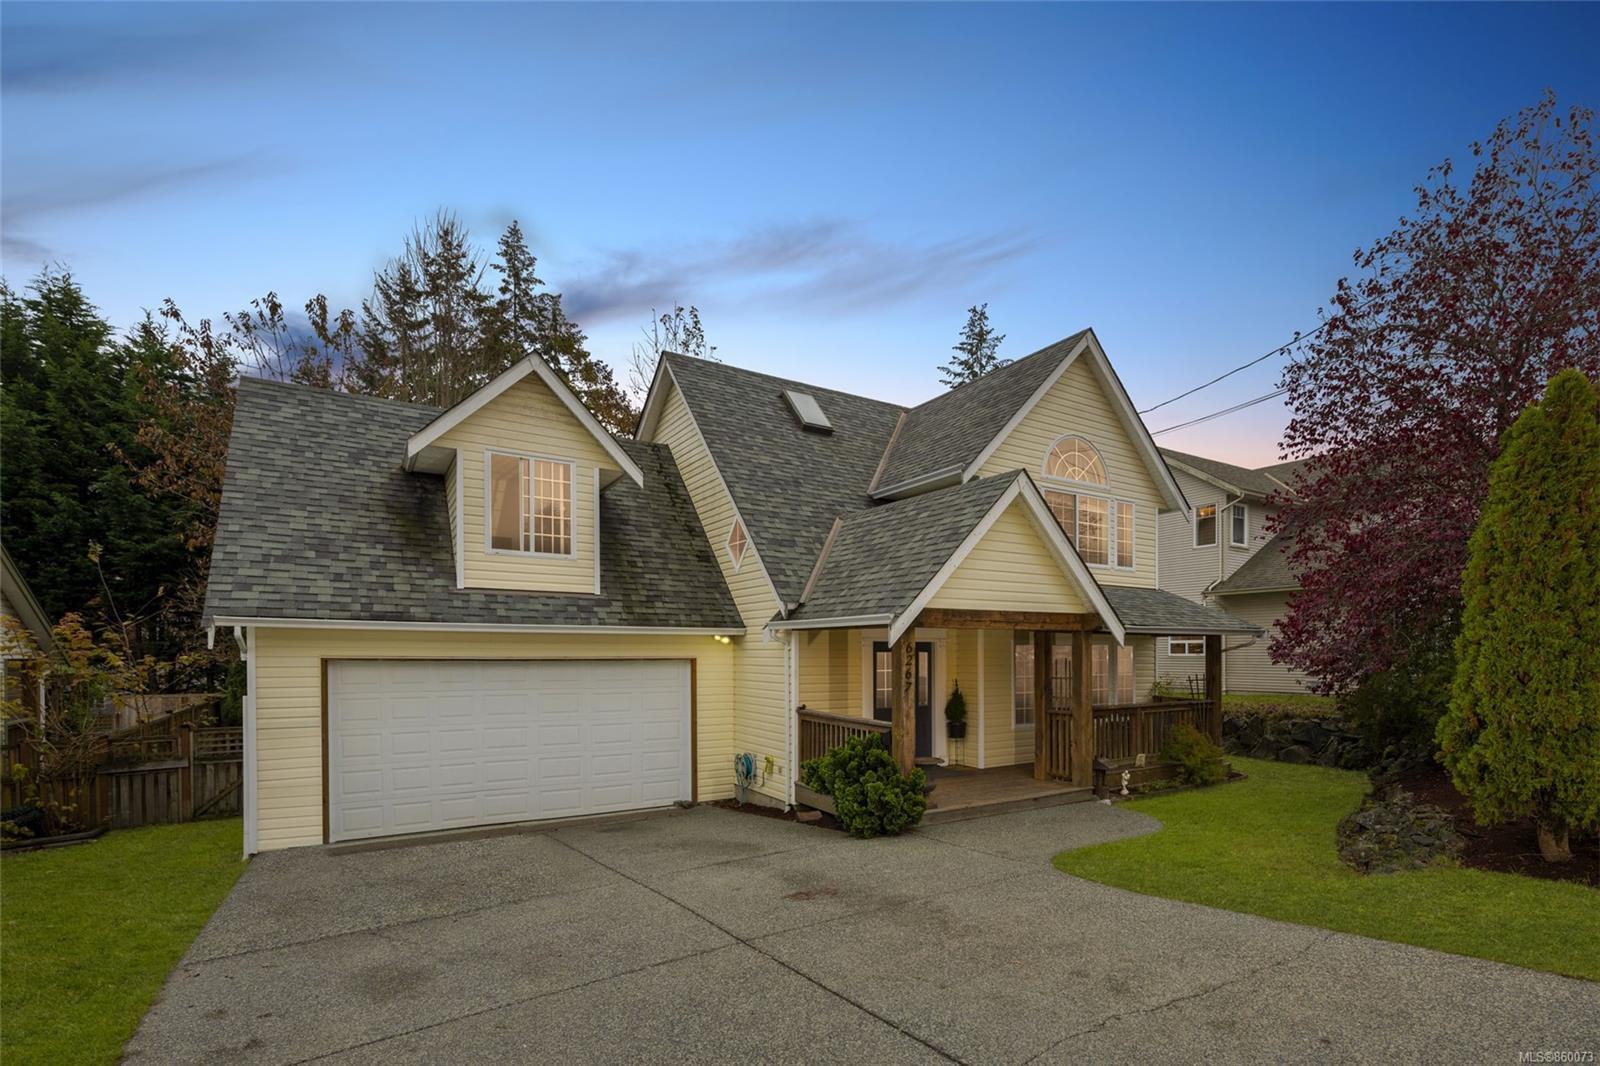 Main Photo: 6267 Lane Rd in : Du West Duncan House for sale (Duncan)  : MLS®# 860073